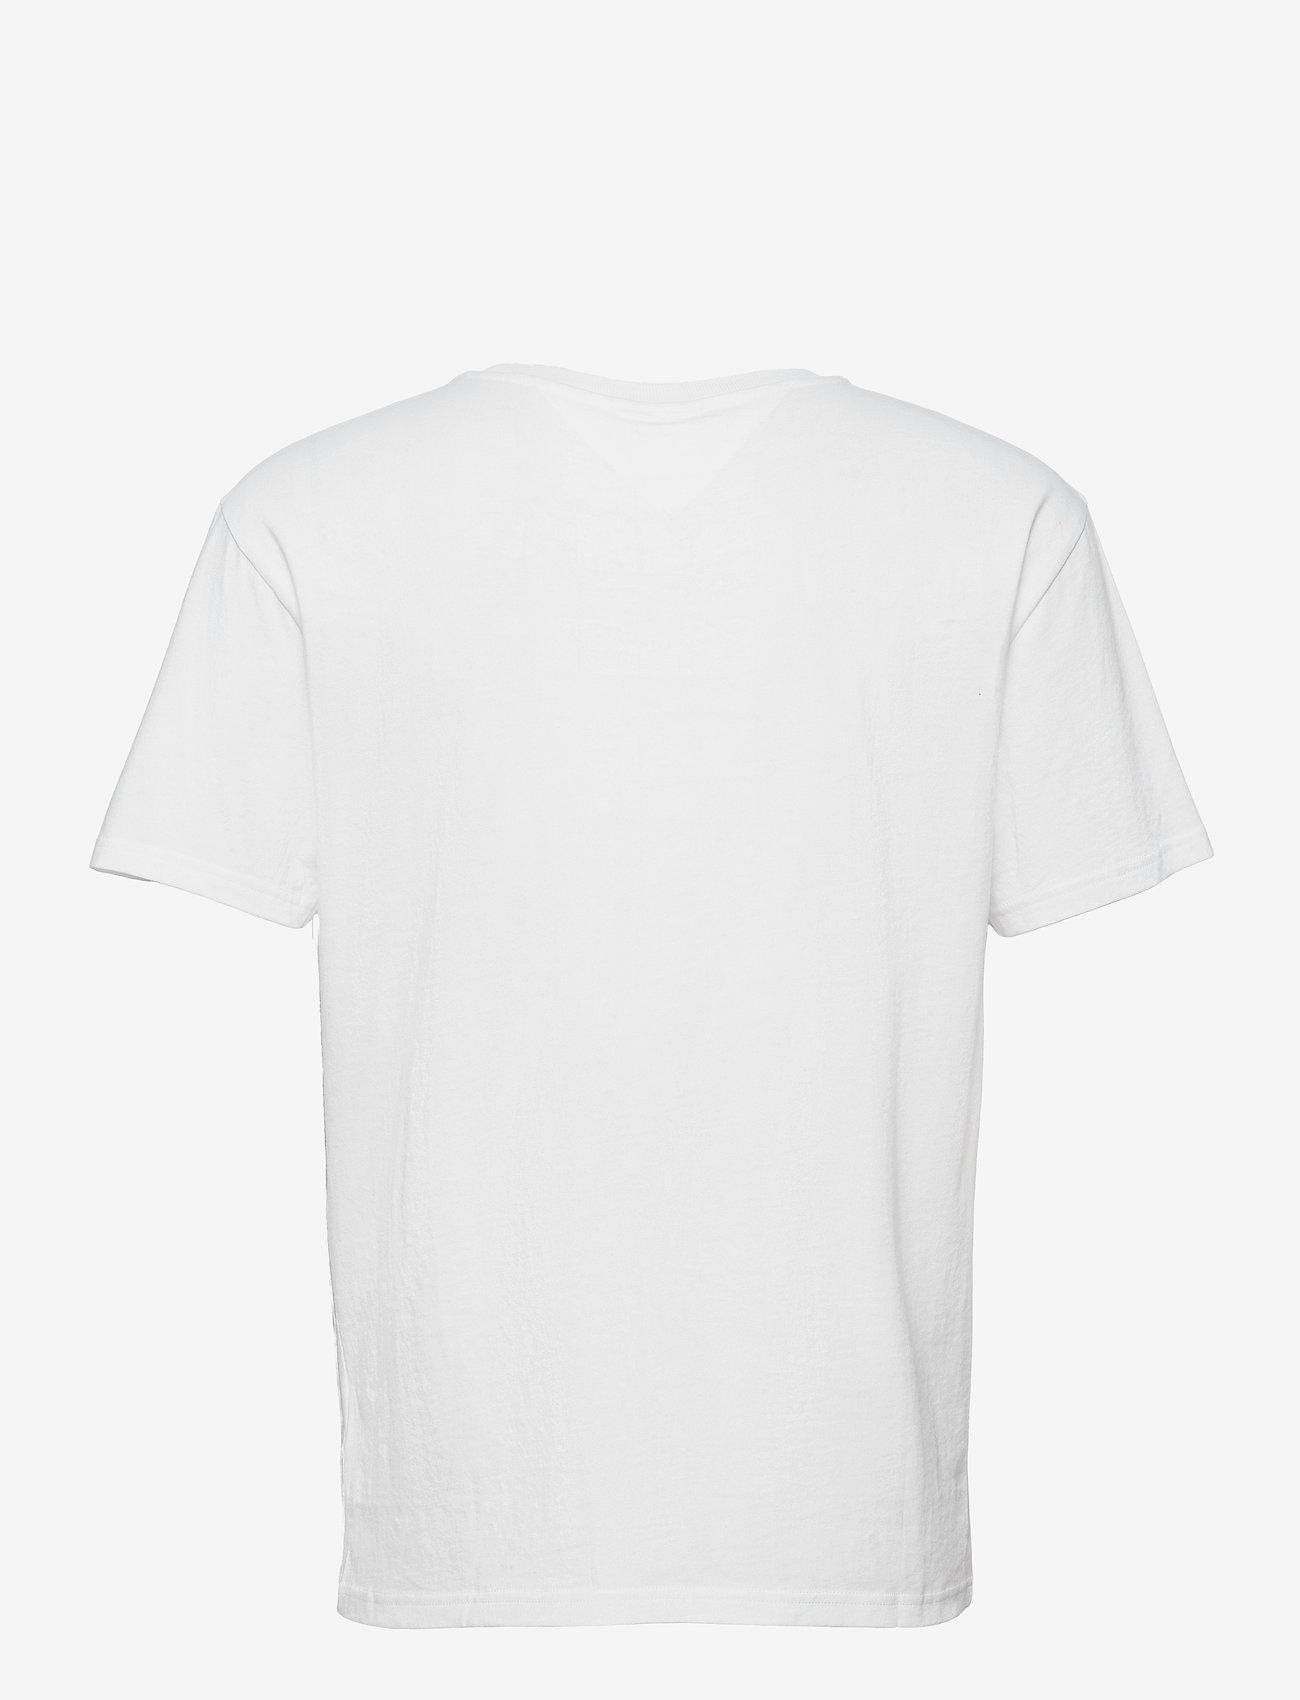 Tommy Jeans - TJM MULTICOLOR FLAG TEE - kortärmade t-shirts - white - 1